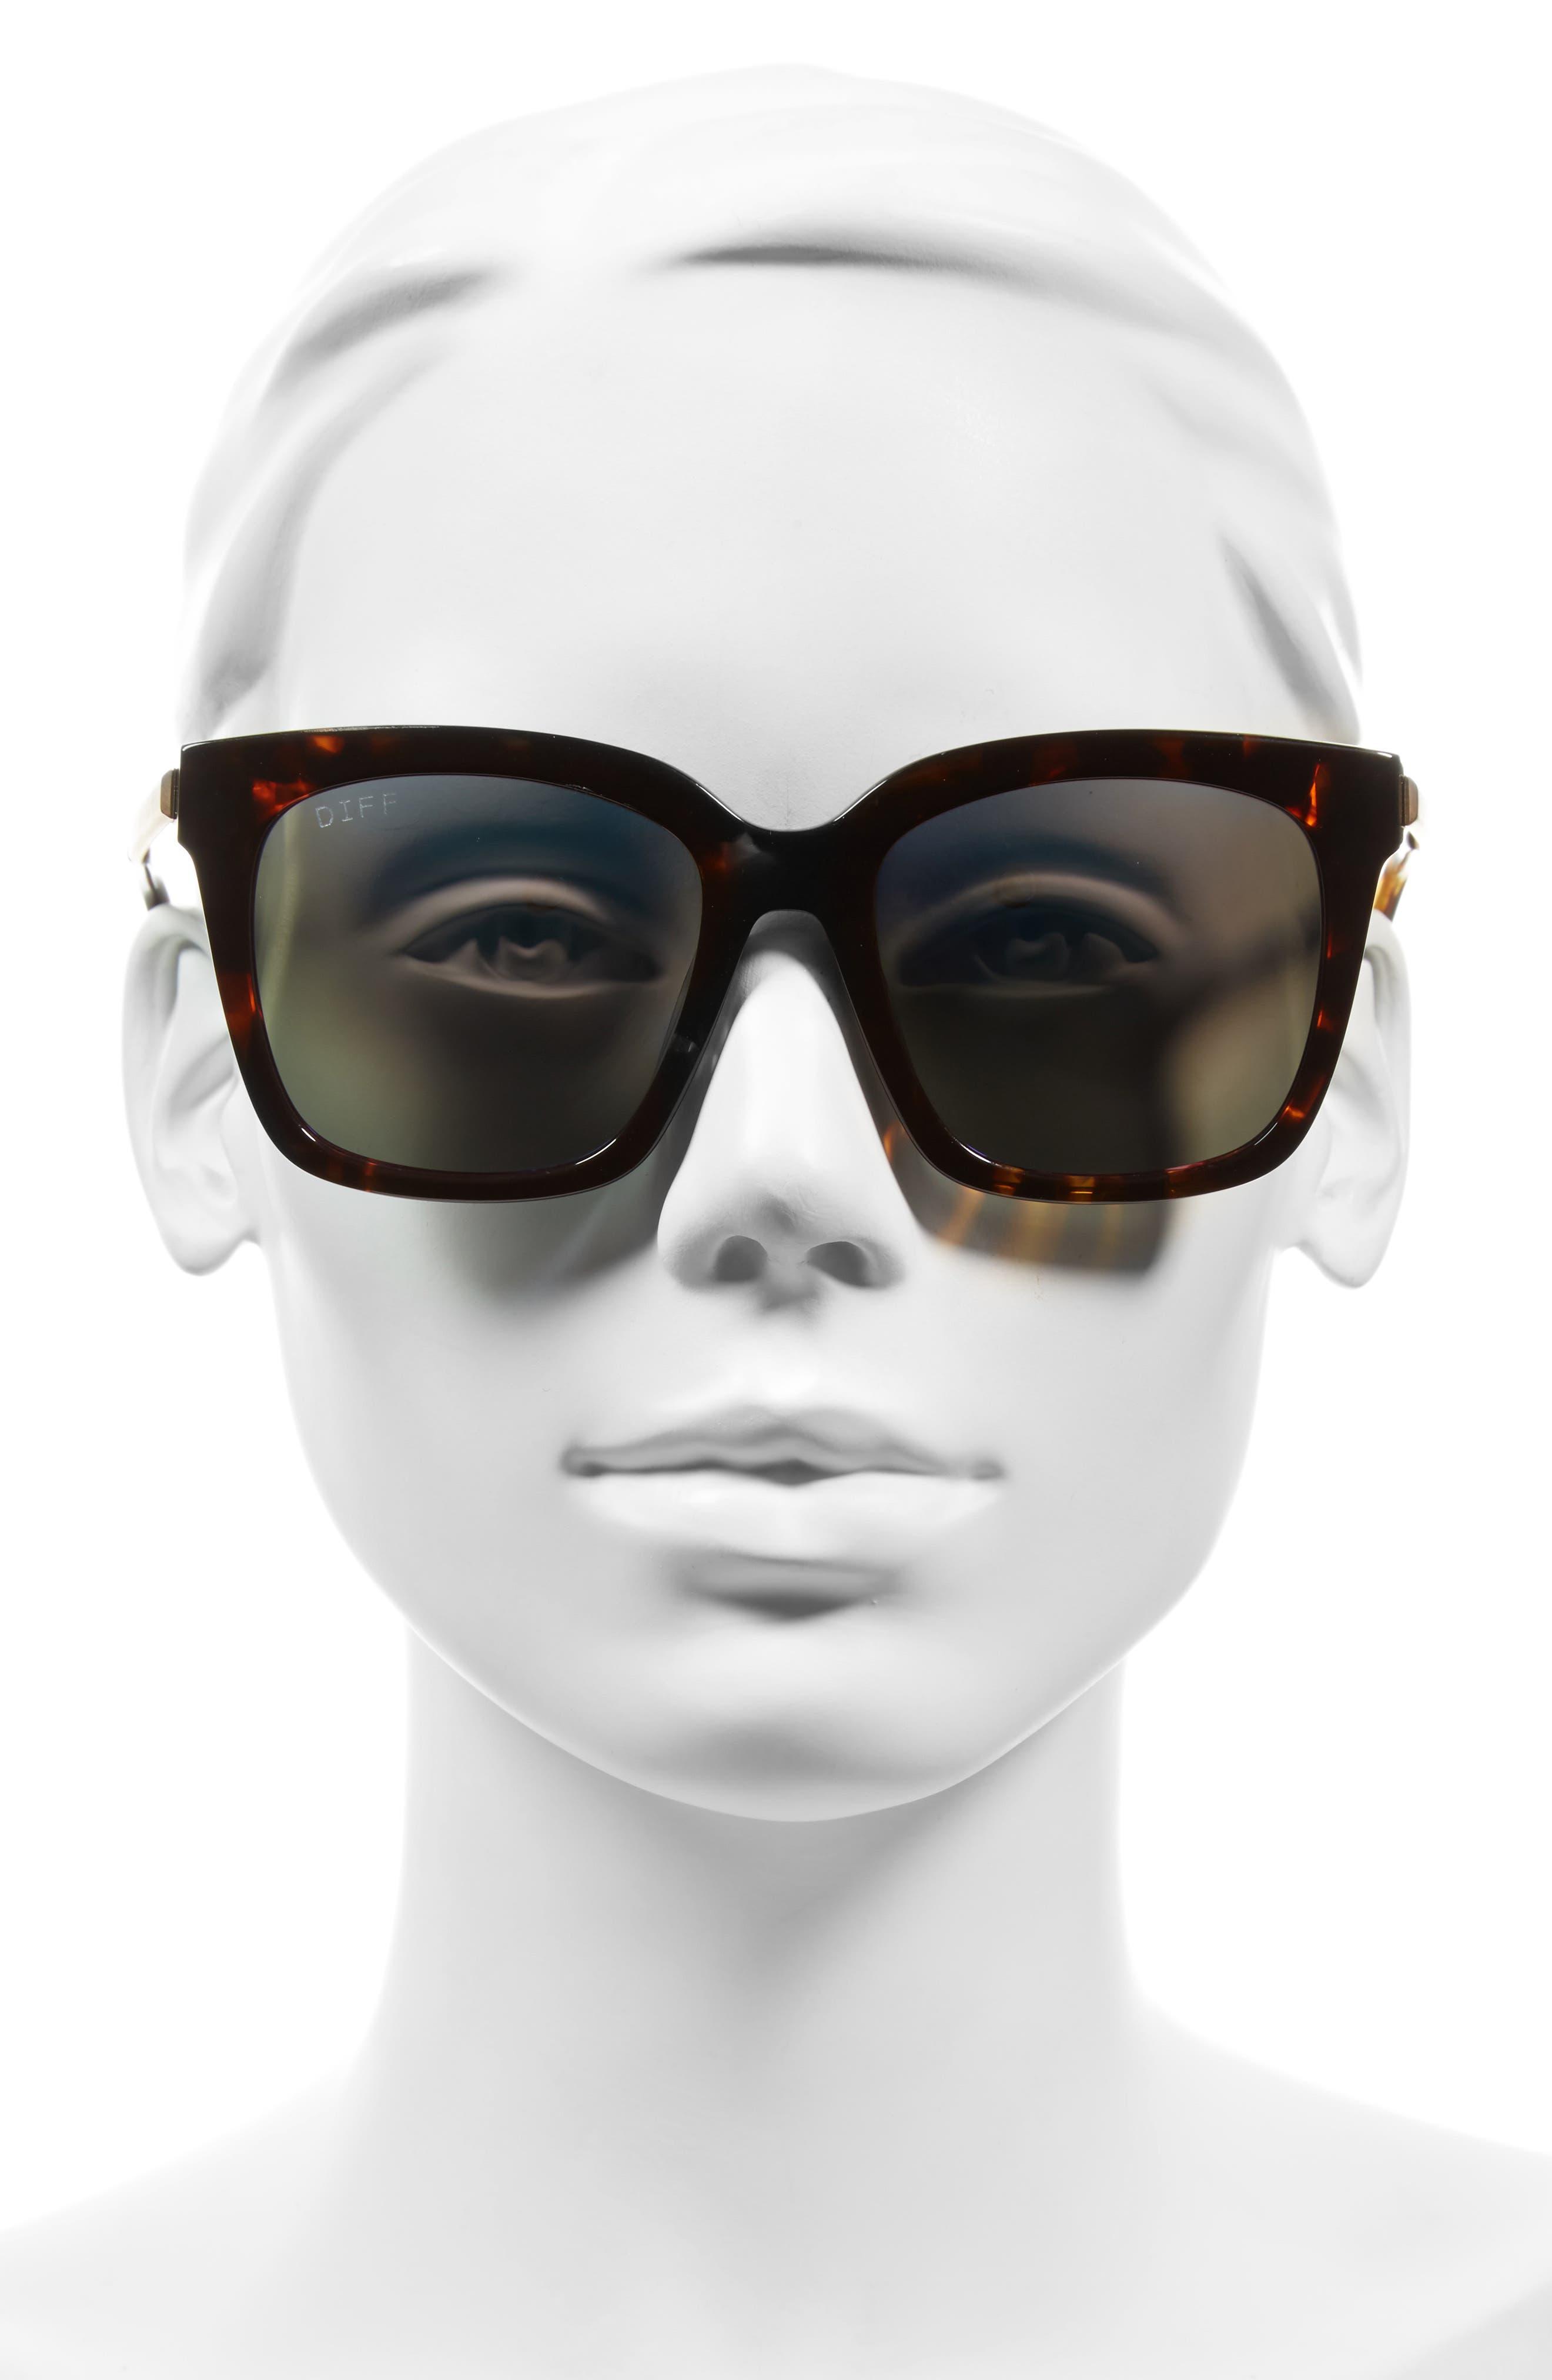 Bella 52mm Polarized Sunglasses,                             Alternate thumbnail 4, color,                             Tortoise/ Blue